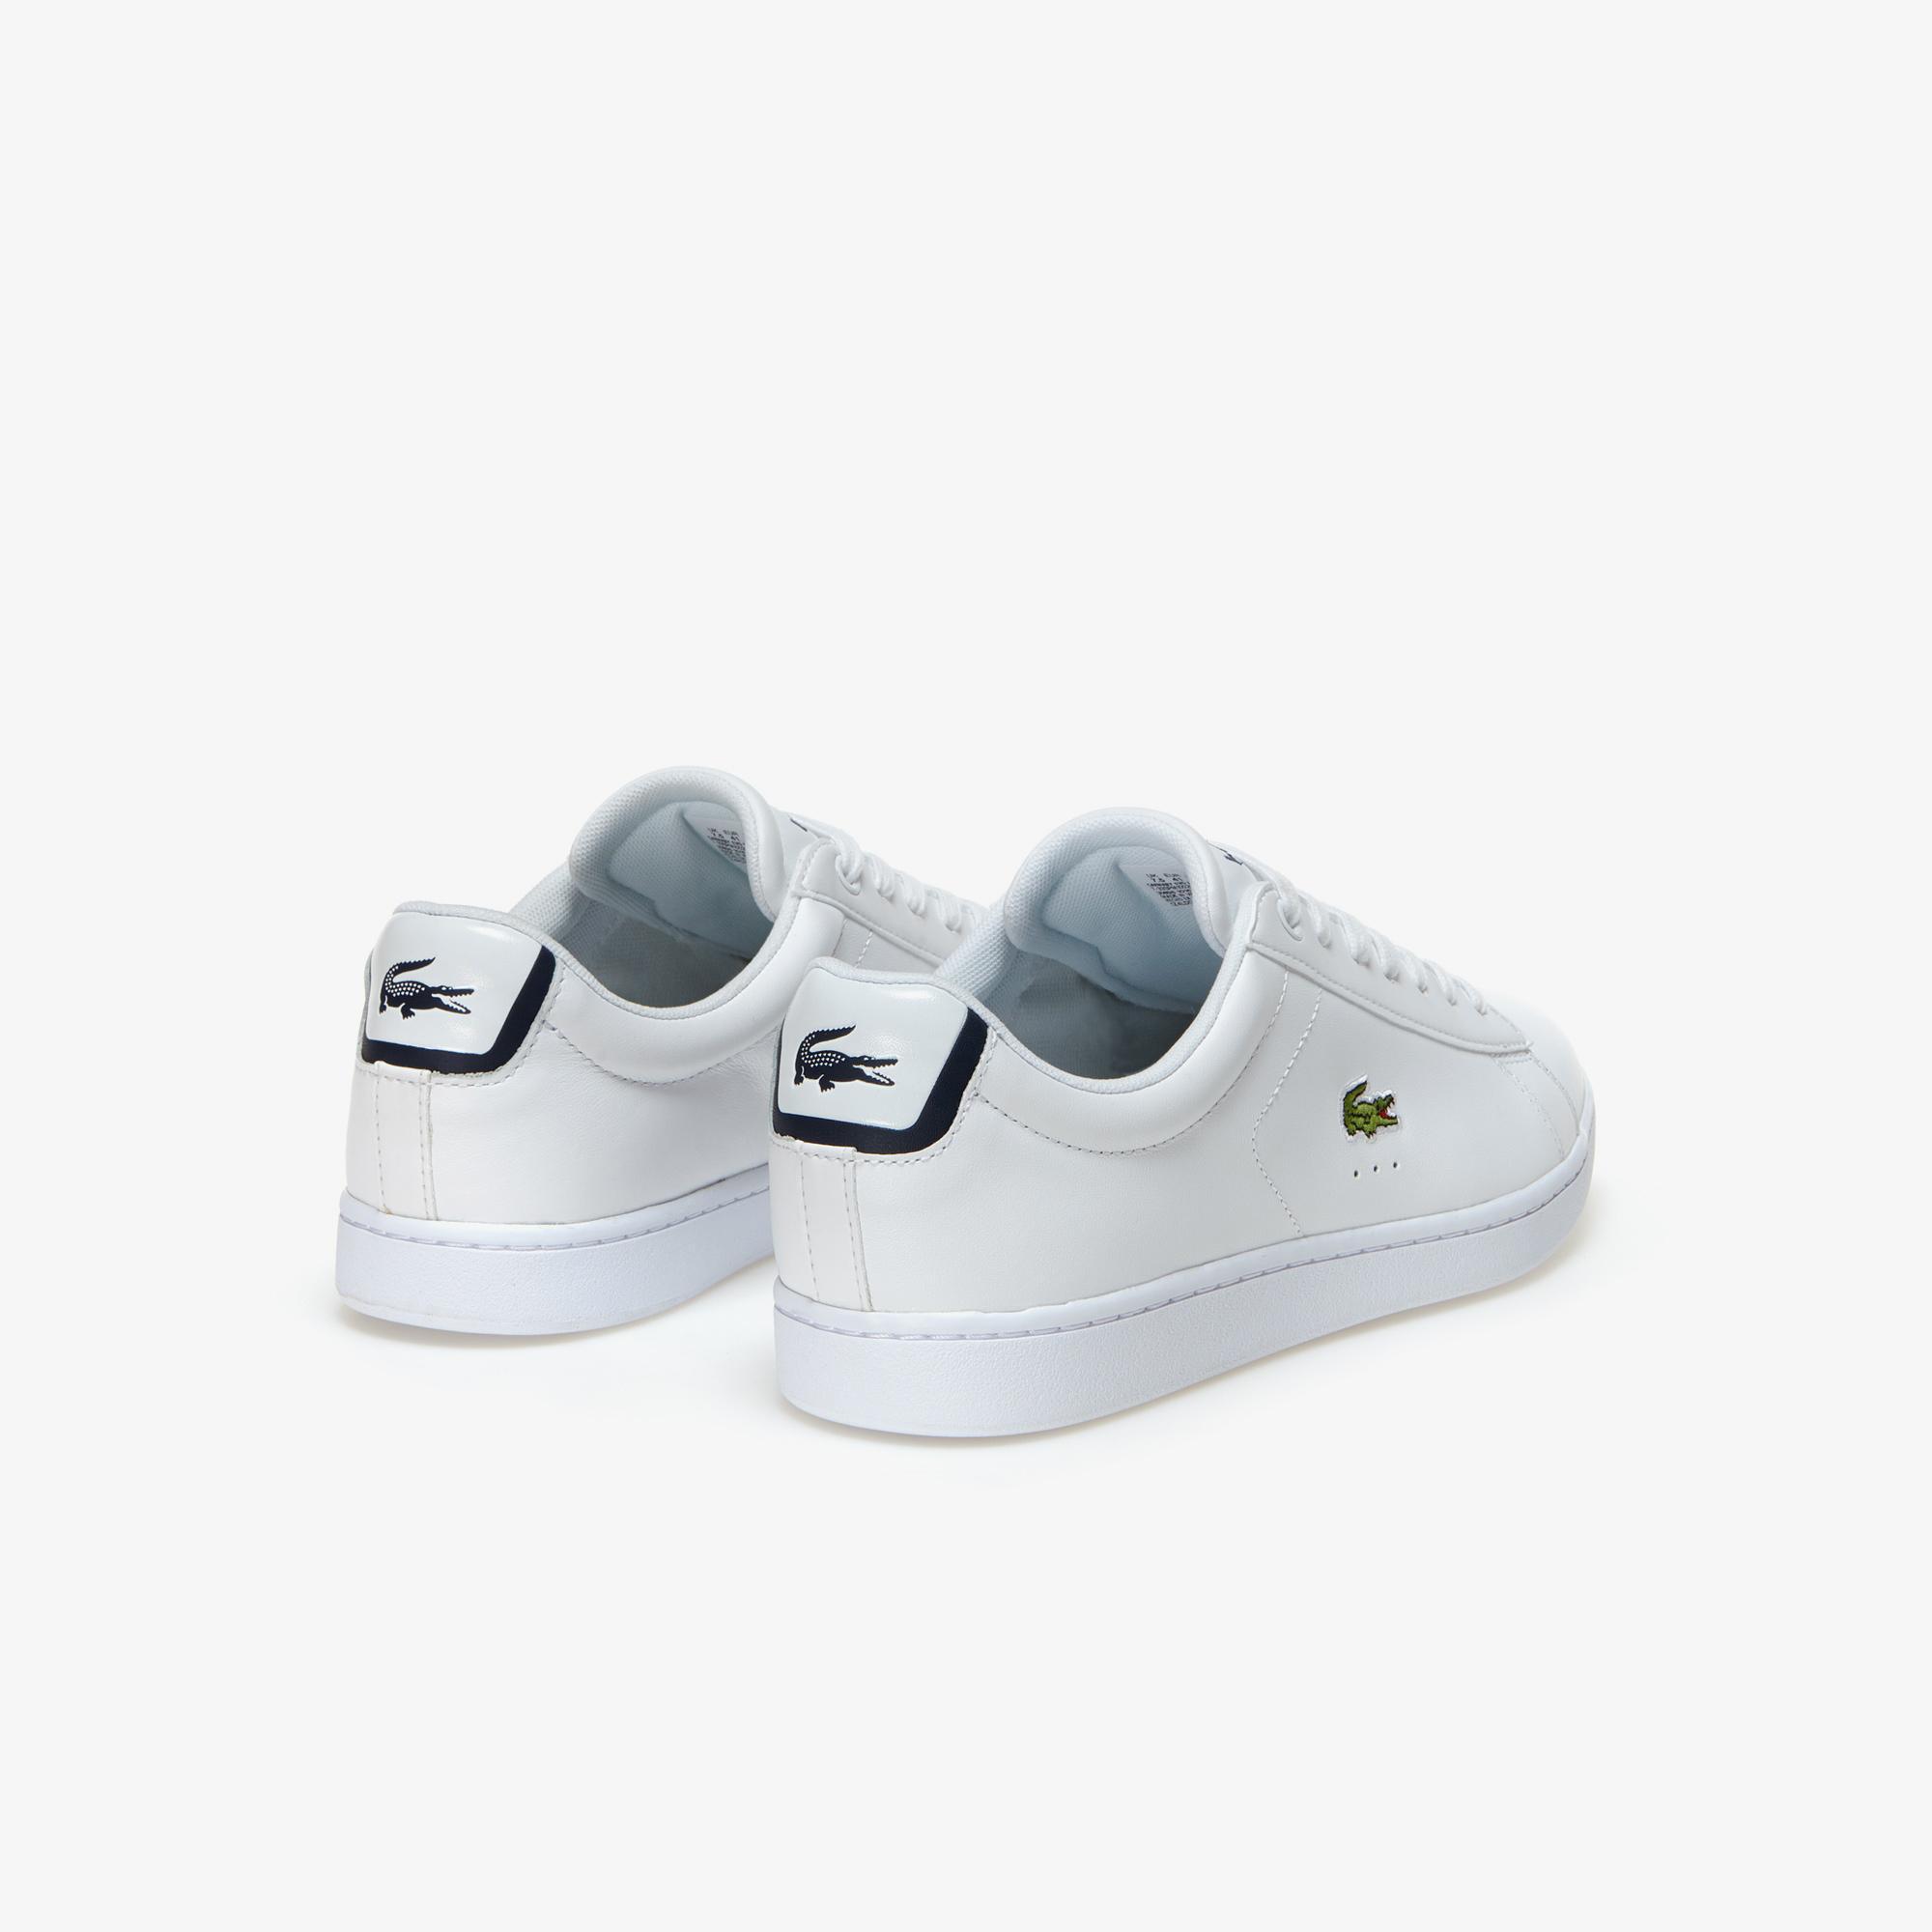 Lacoste Carnaby Evo BL 1 Męskie Skórzane Sneakersy